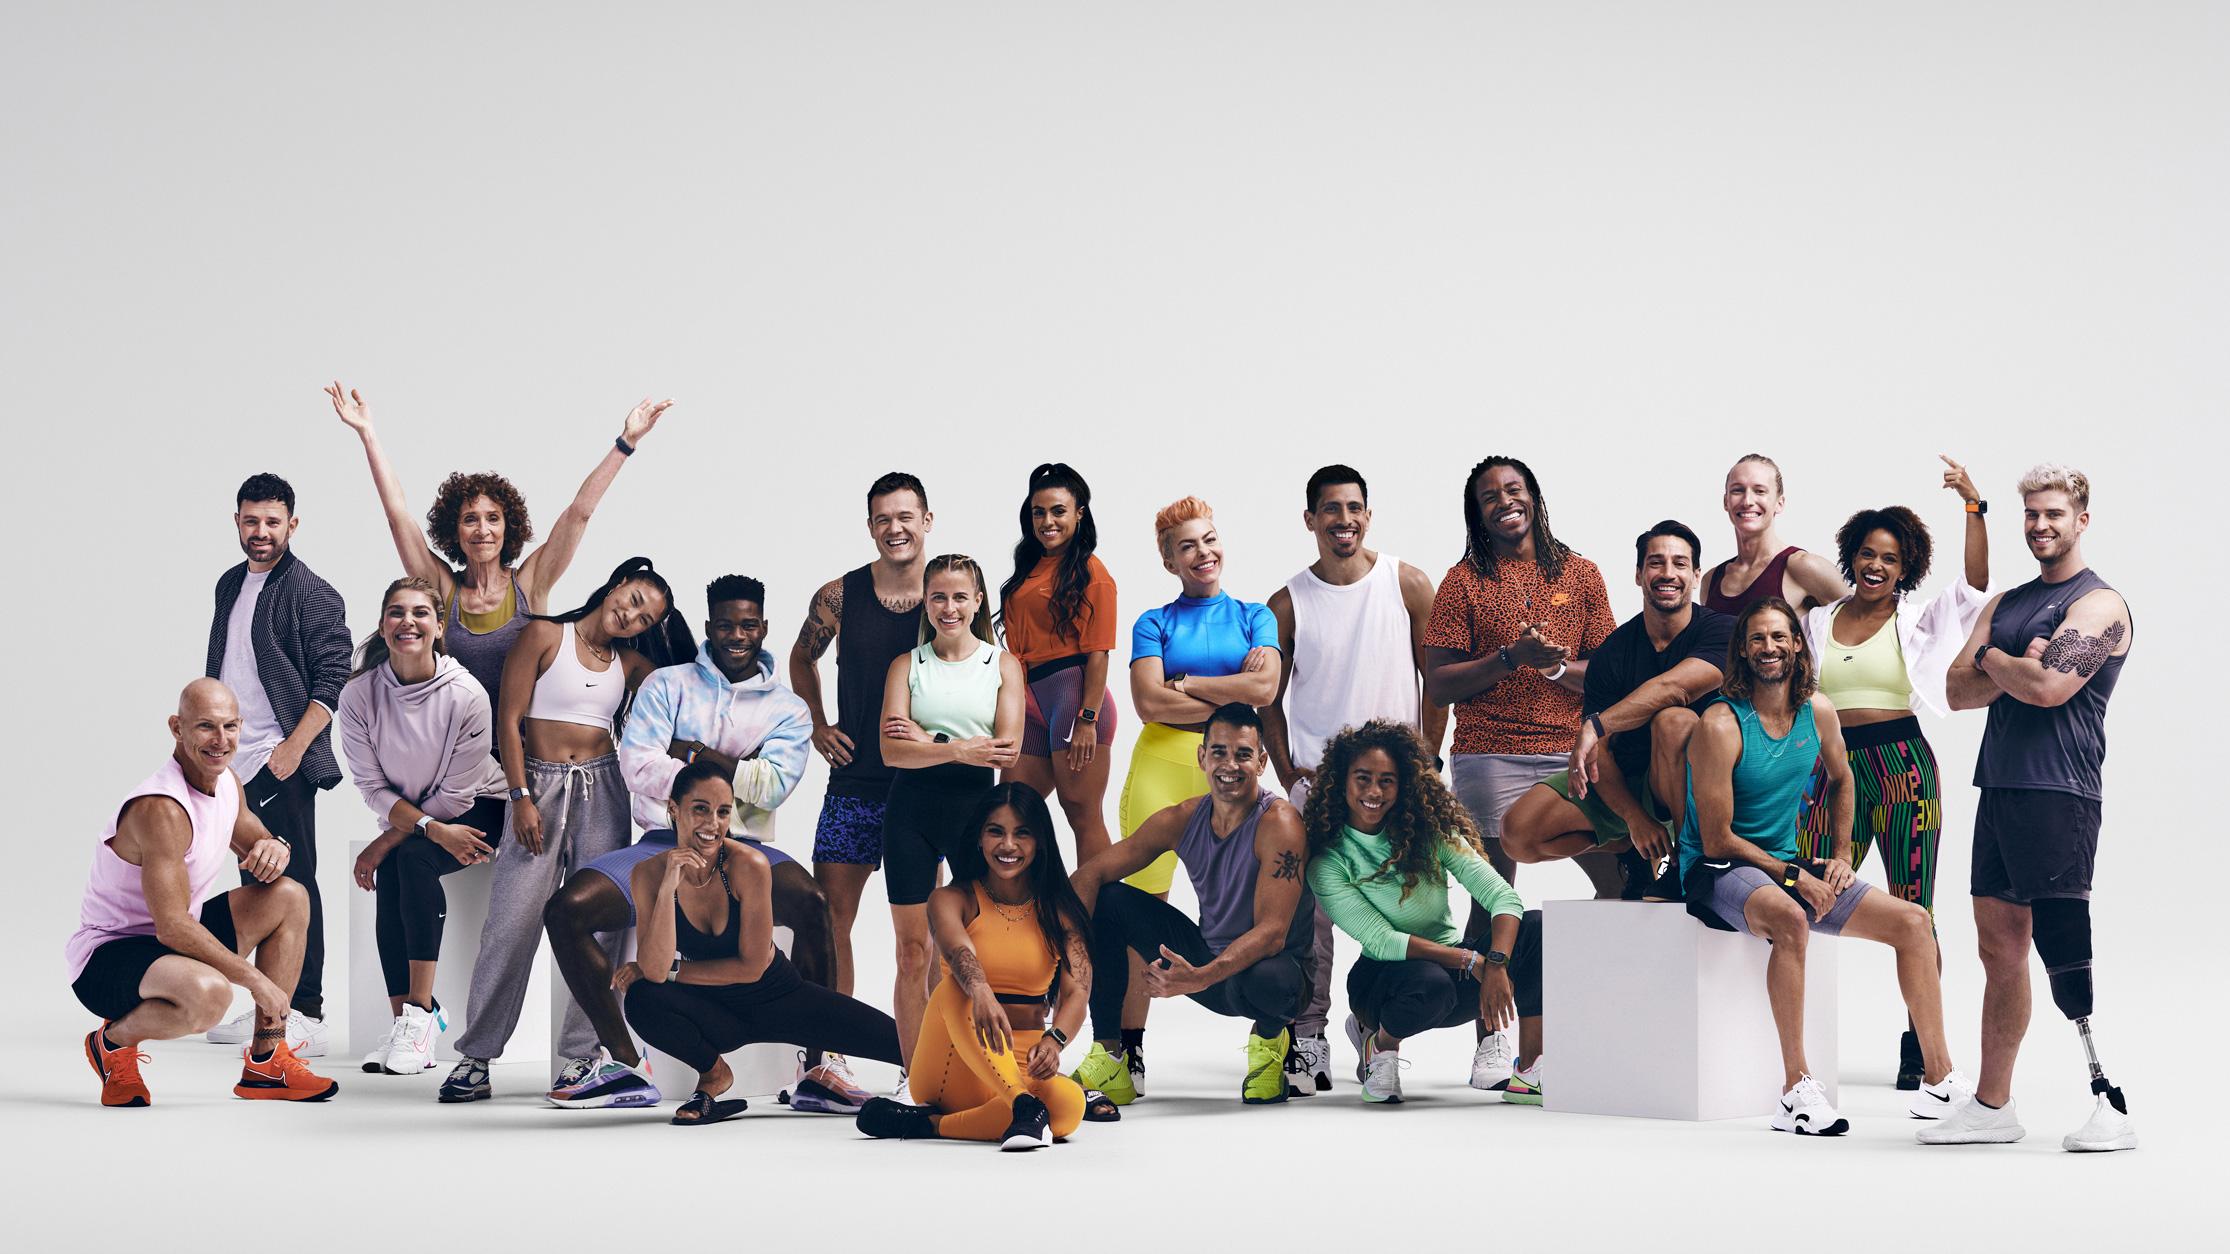 Entrenadores de Fitness+